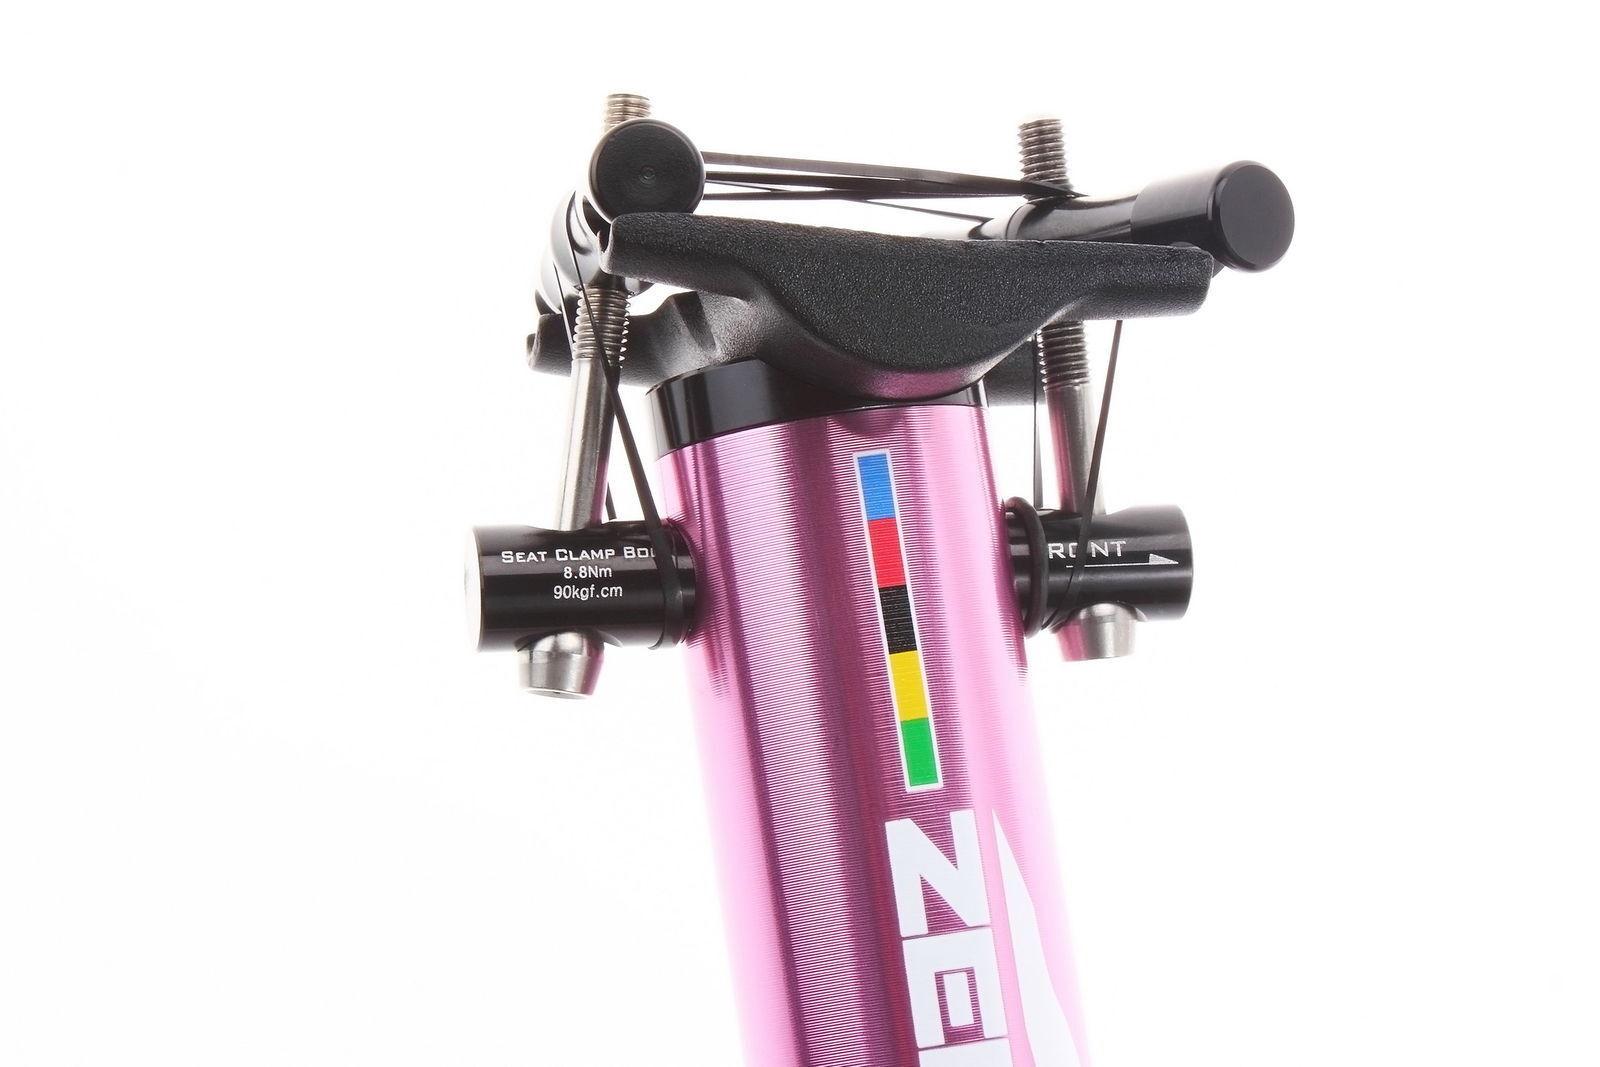 Aerozine XP-Zero Road Mountain MTB Bicycle Bike Seatpost Post 30.9mm 400mm Pink